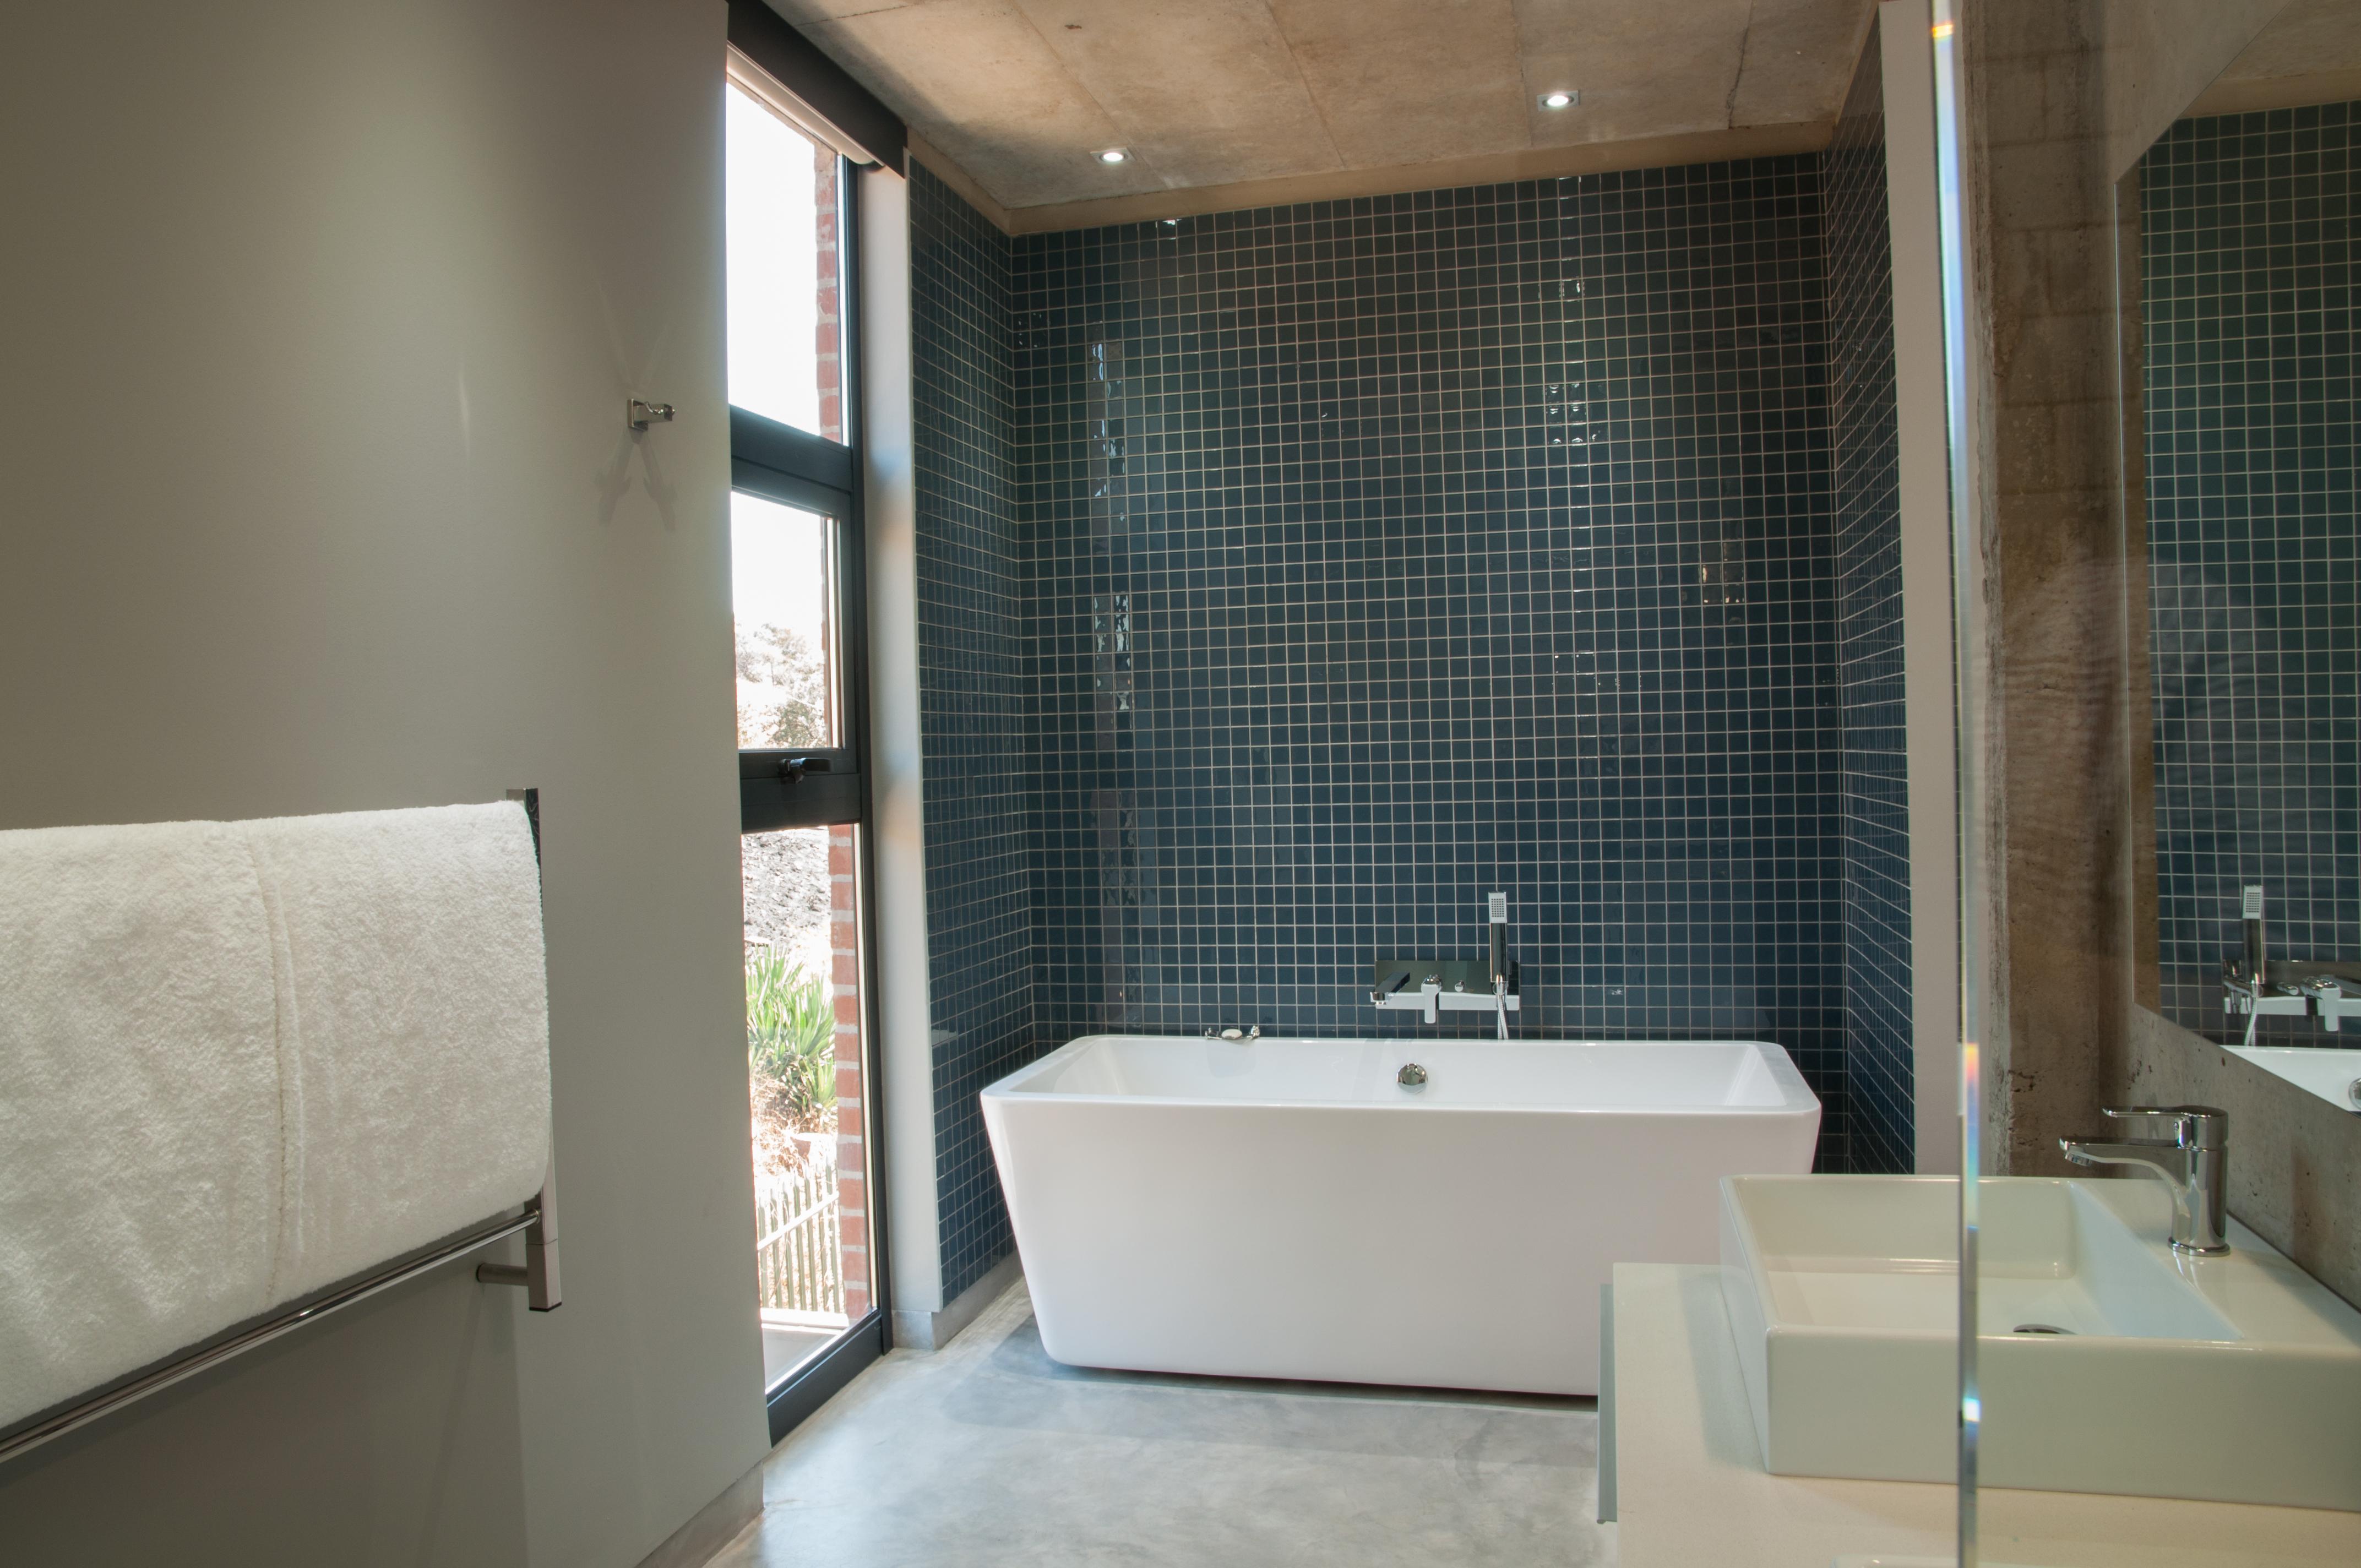 Architecture & Interior Design Photography